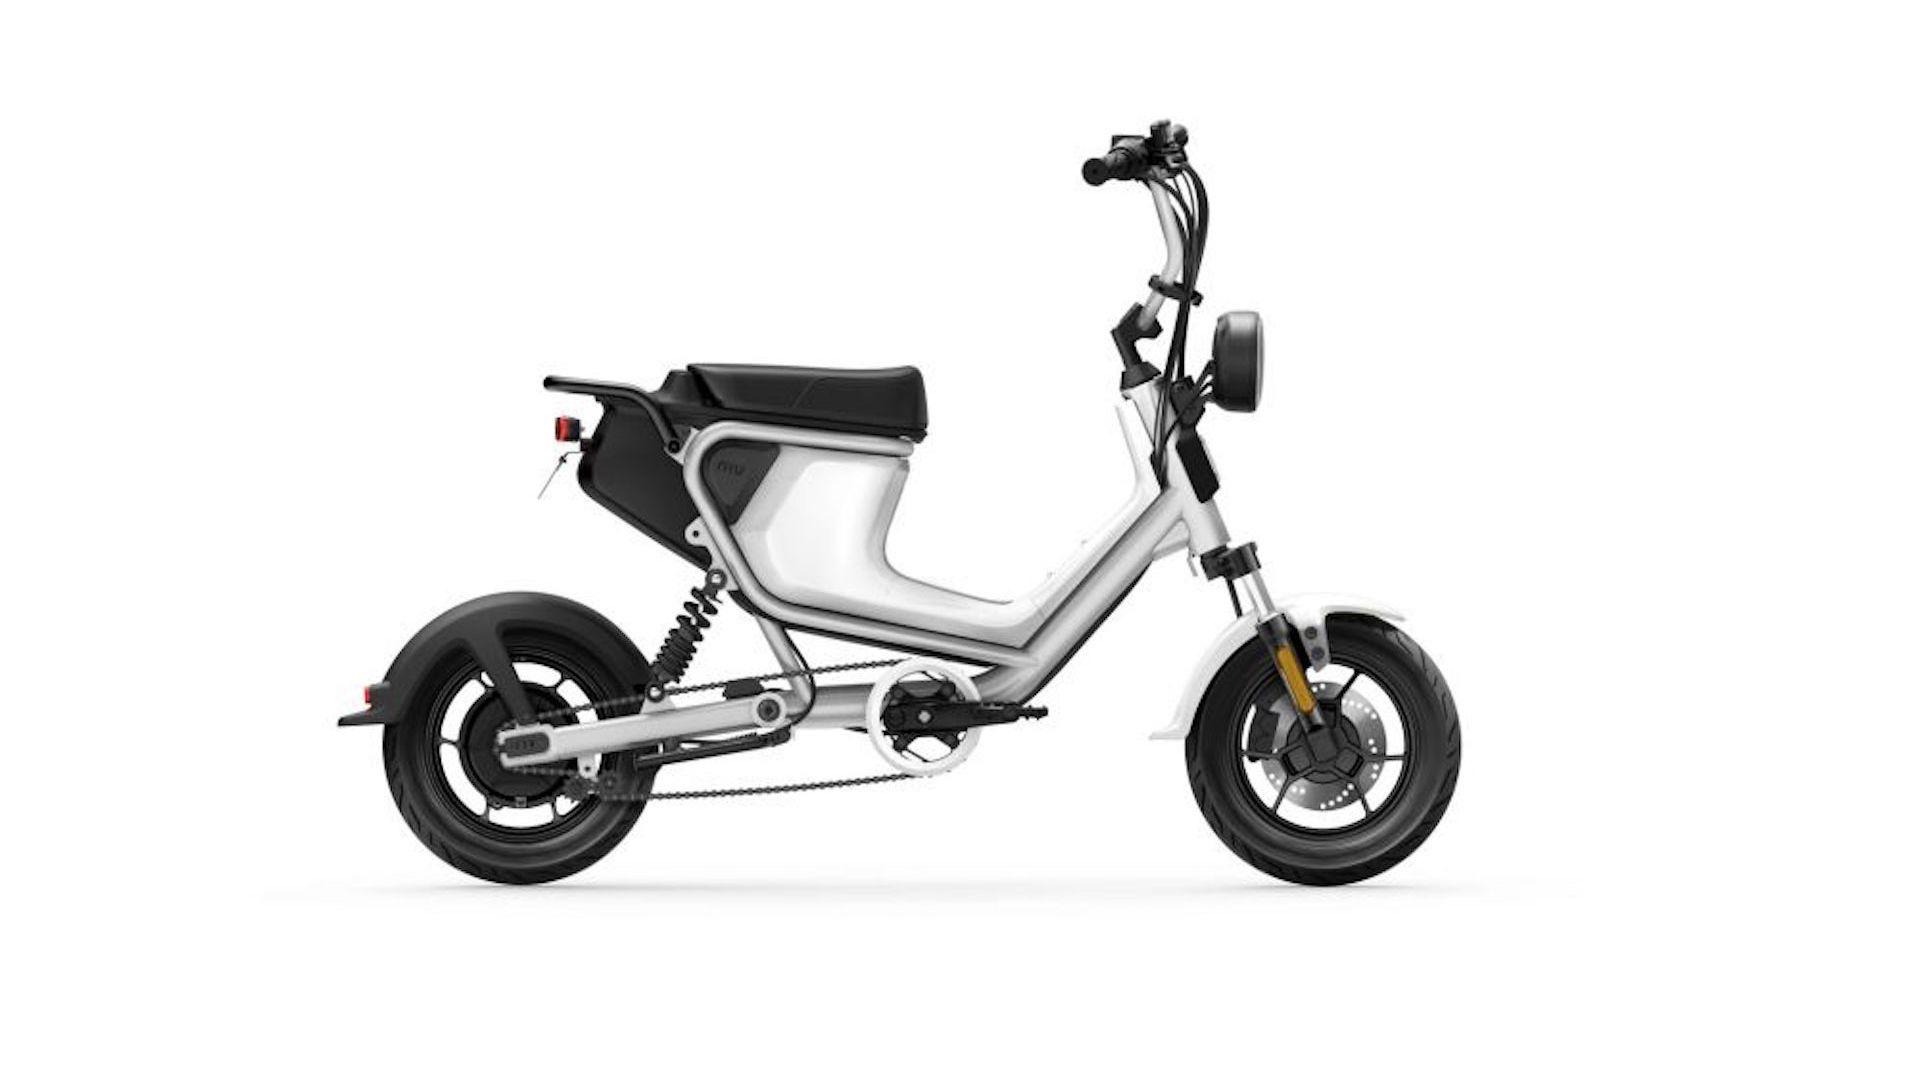 niu pr sente son u mini un scooter lectrique l 39 allure. Black Bedroom Furniture Sets. Home Design Ideas